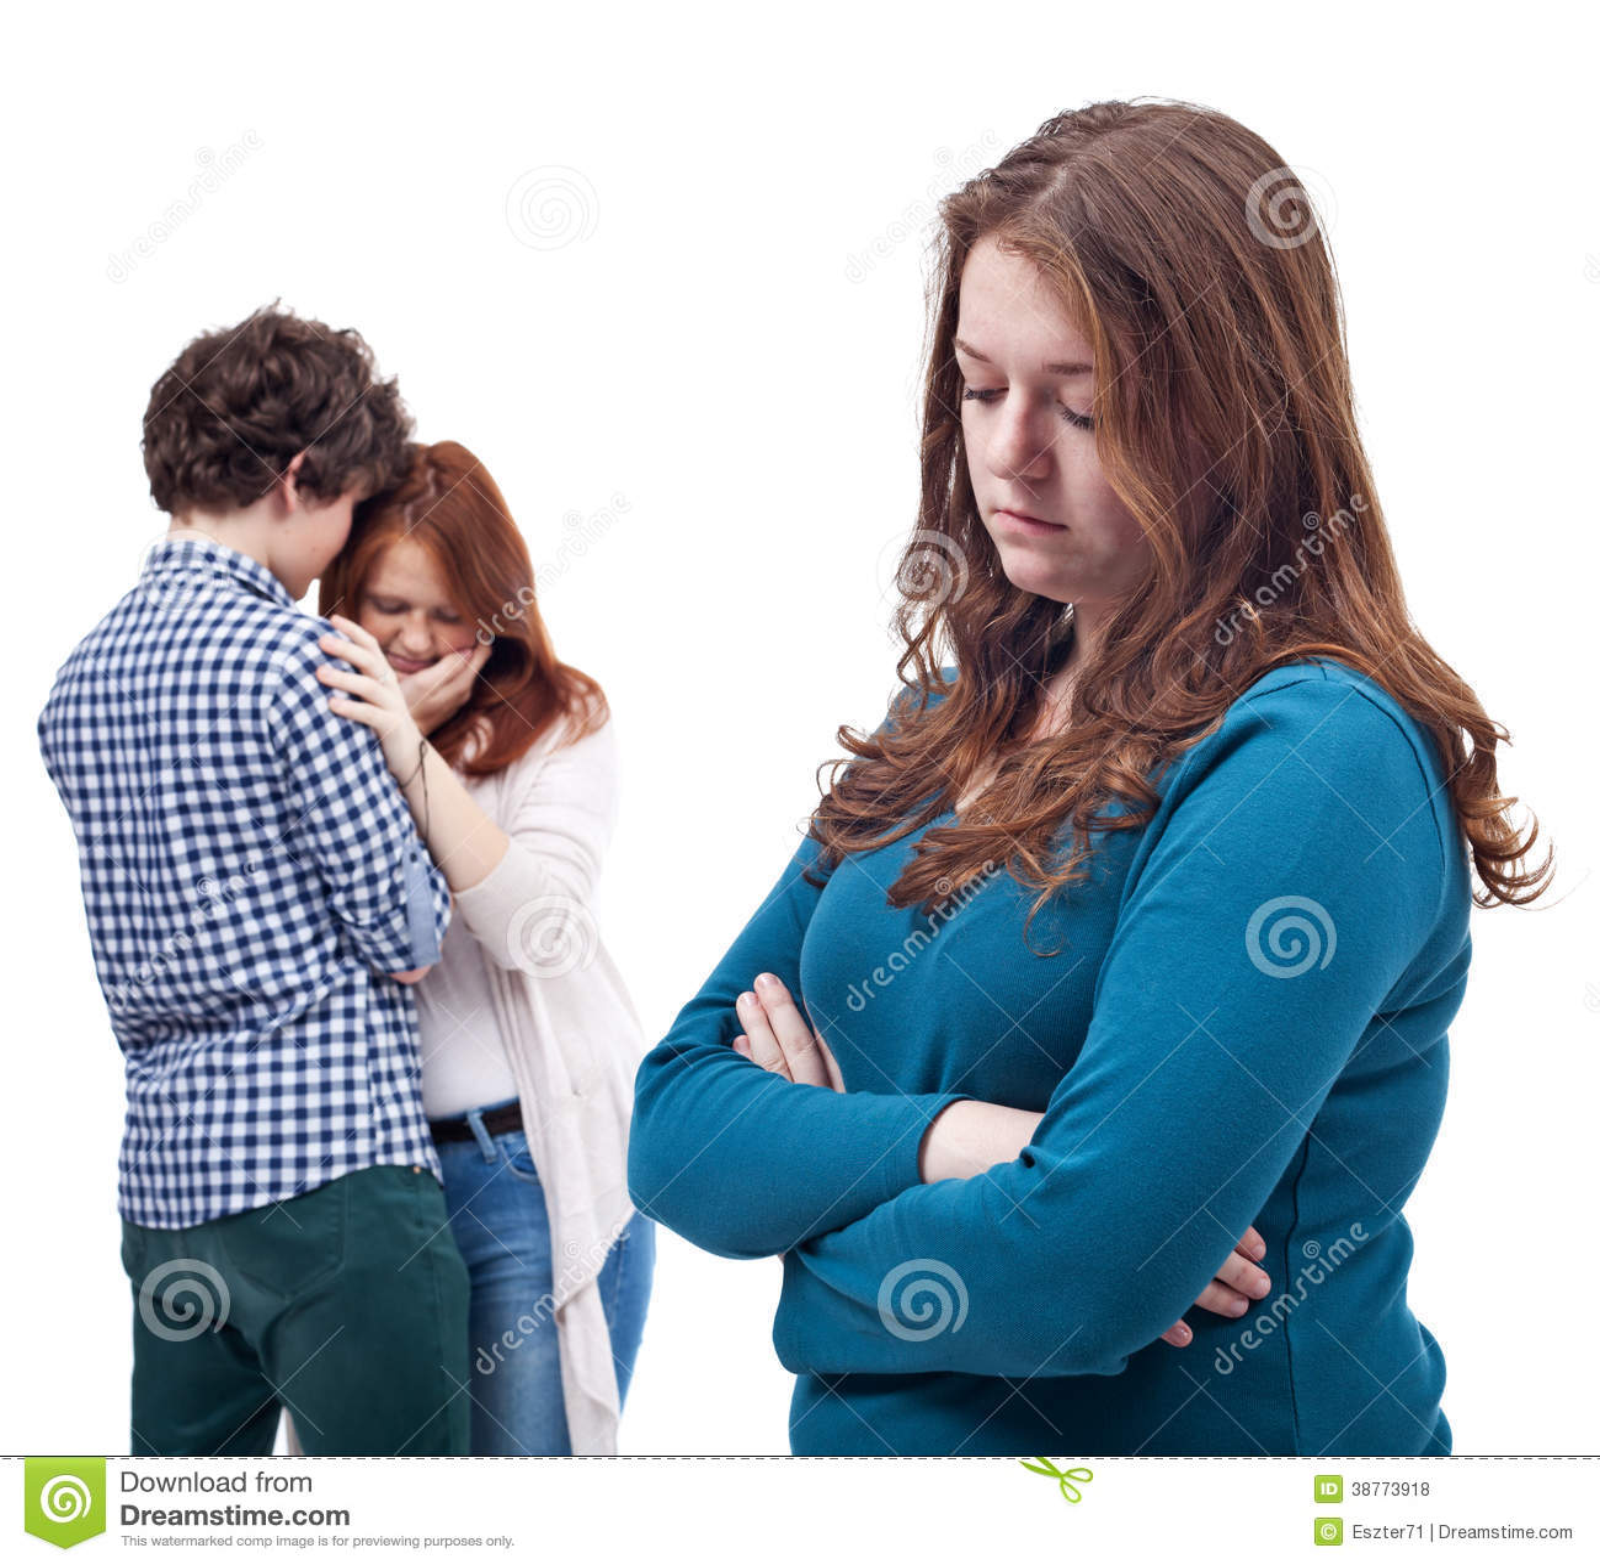 Sad Girl And Happy Couple Stock Photo Image Of Female 38773918